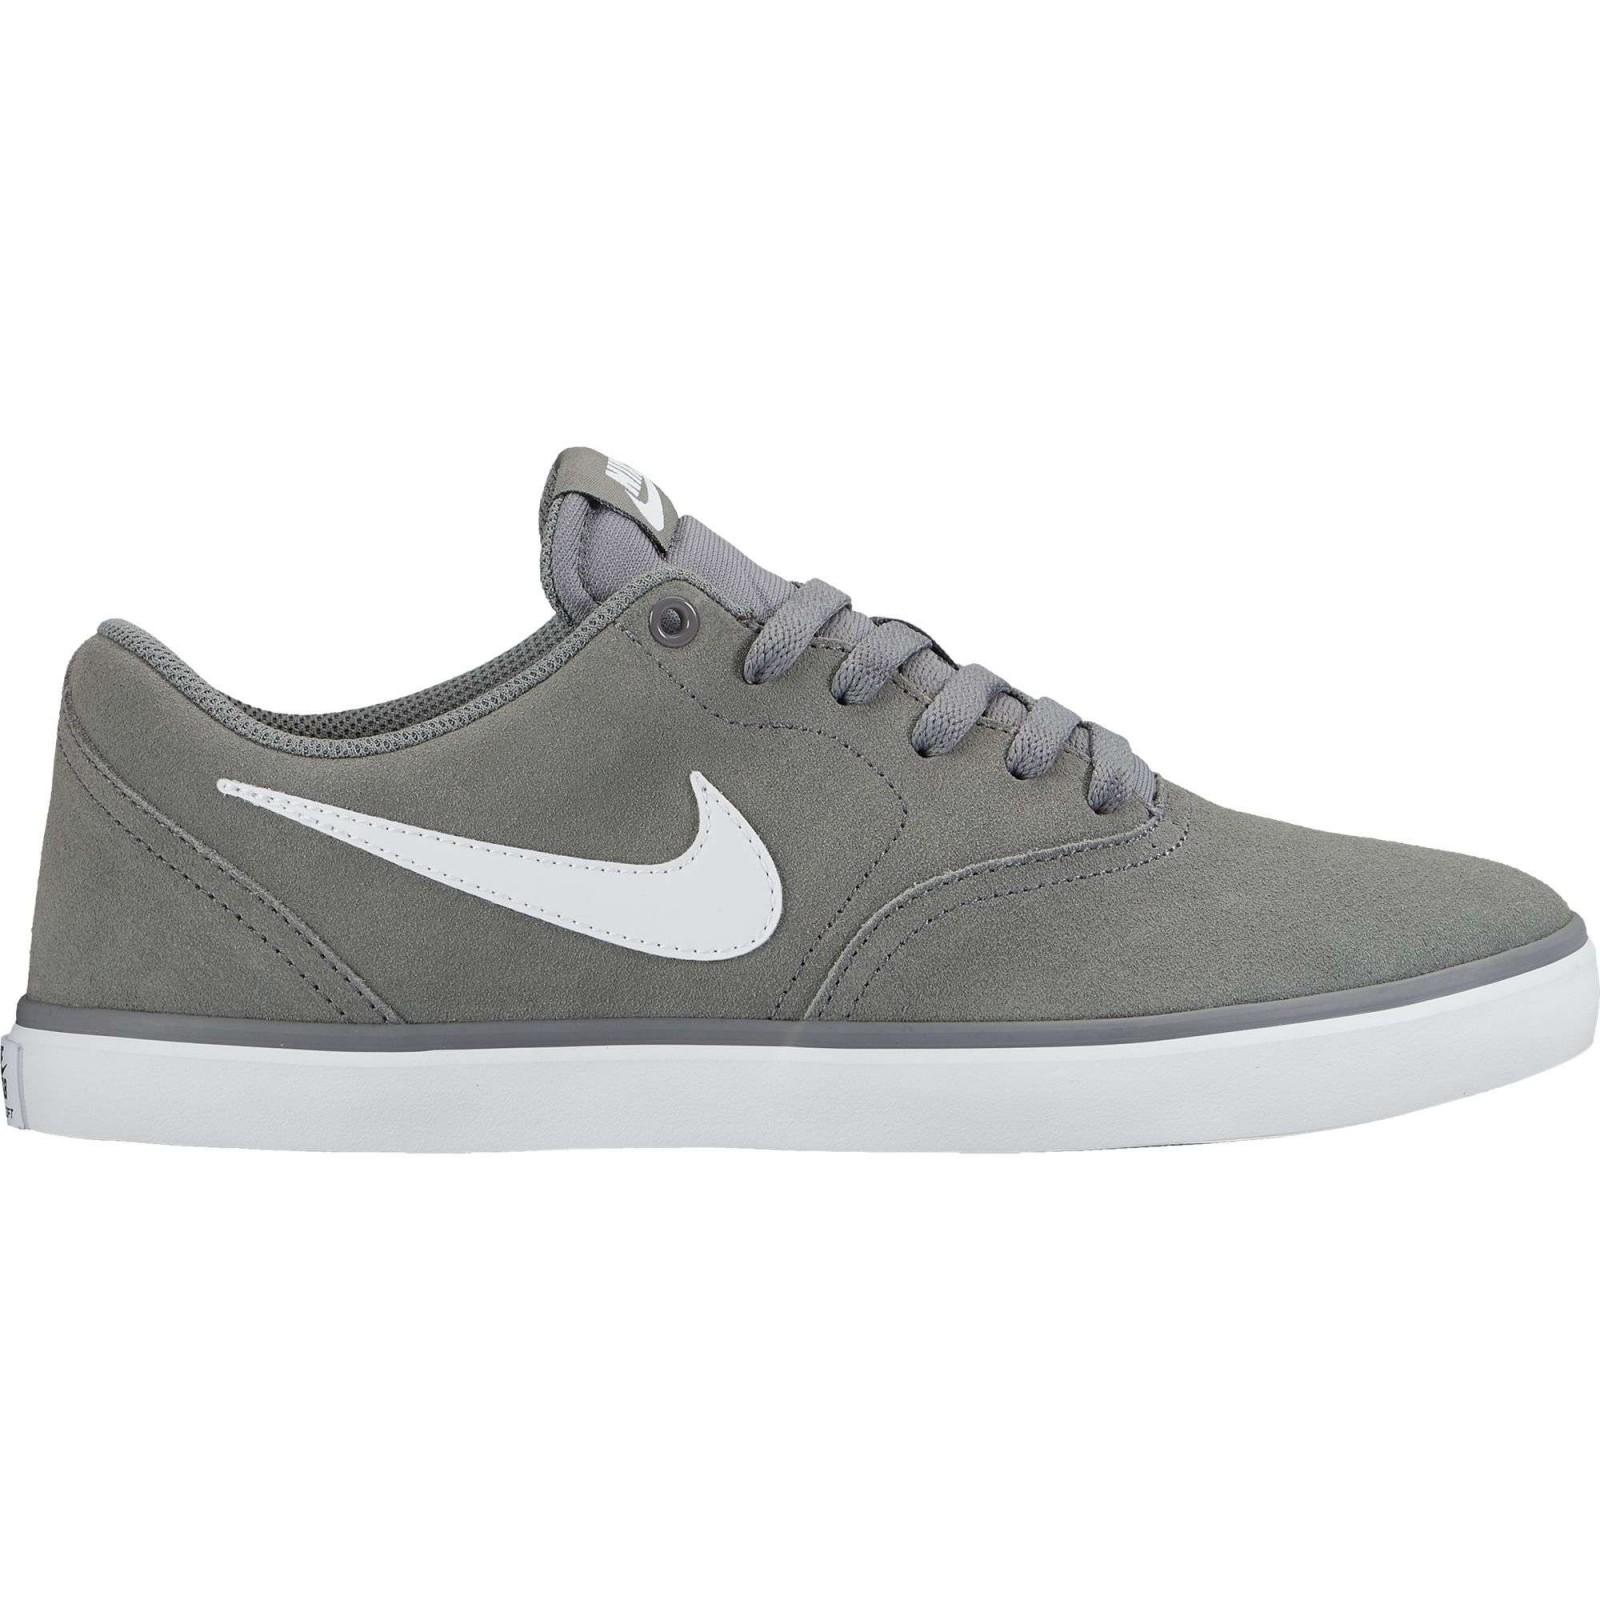 super popular aea3a 7bfa6 ... tenisky Nike SB CHECK SOLAR COOL GREY WHITE. -26%. Pánské ...